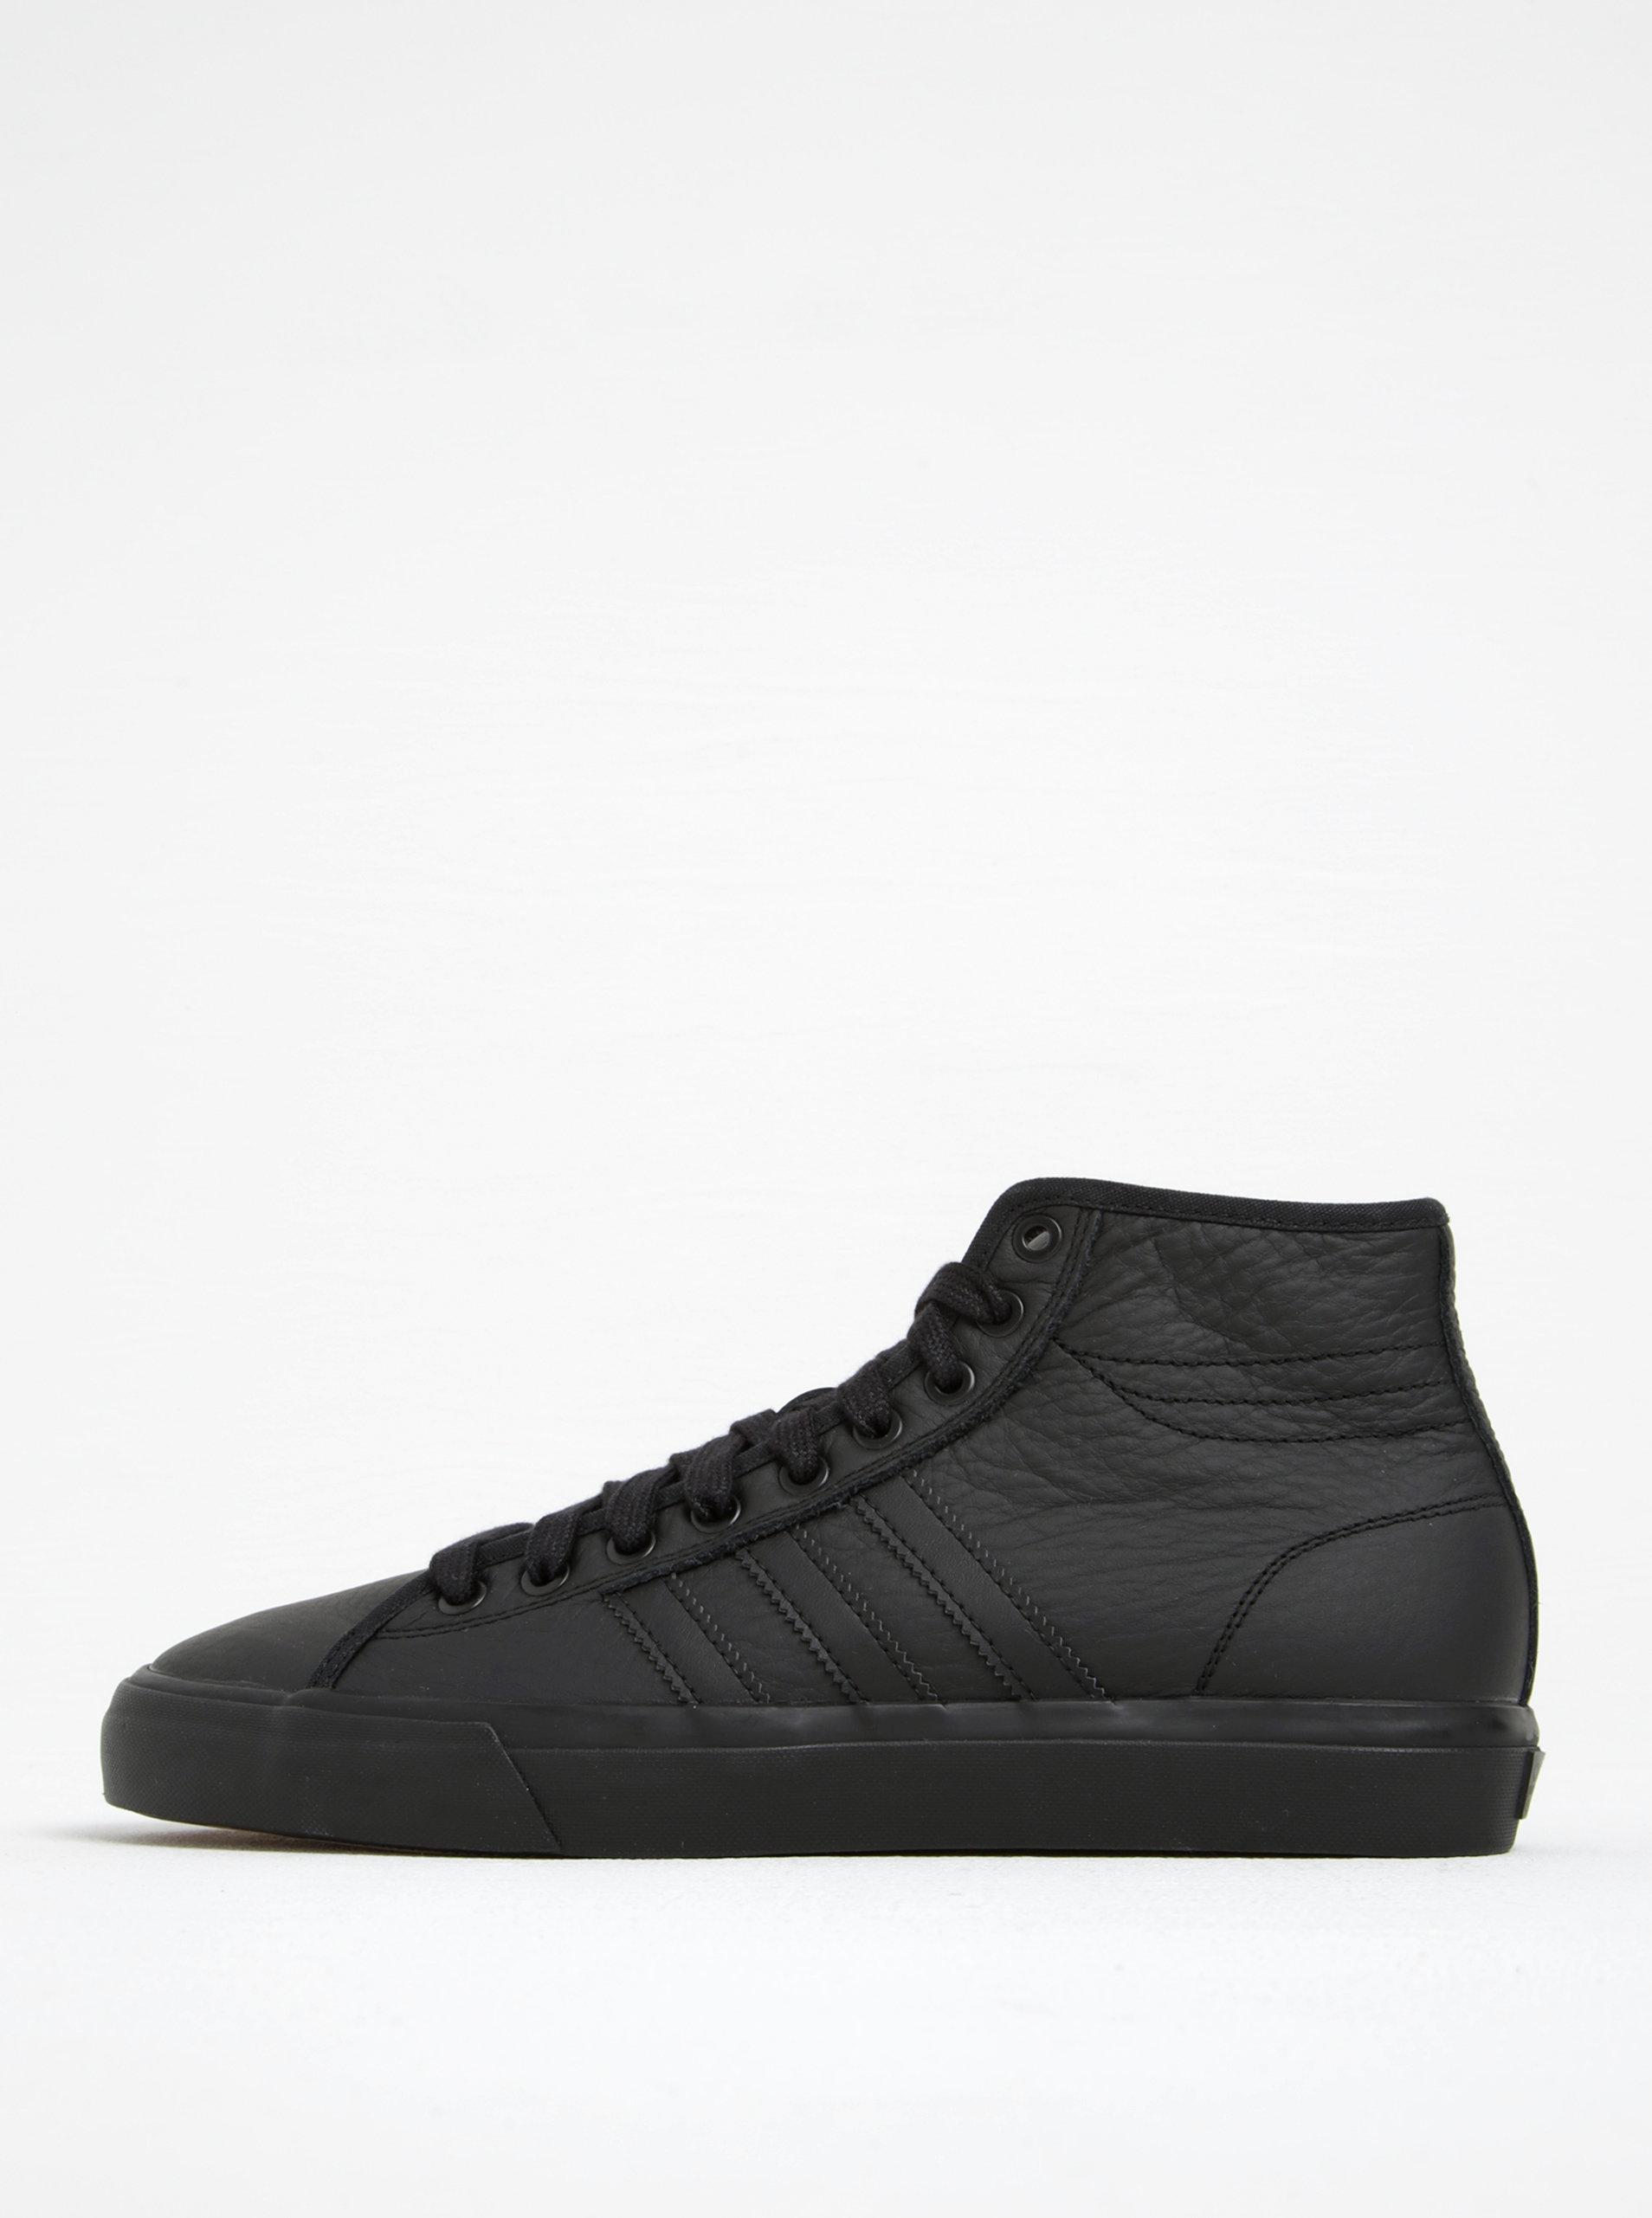 0350488ad Černé pánské kožené kotníkové tenisky adidas Originals Matchcourt High ...